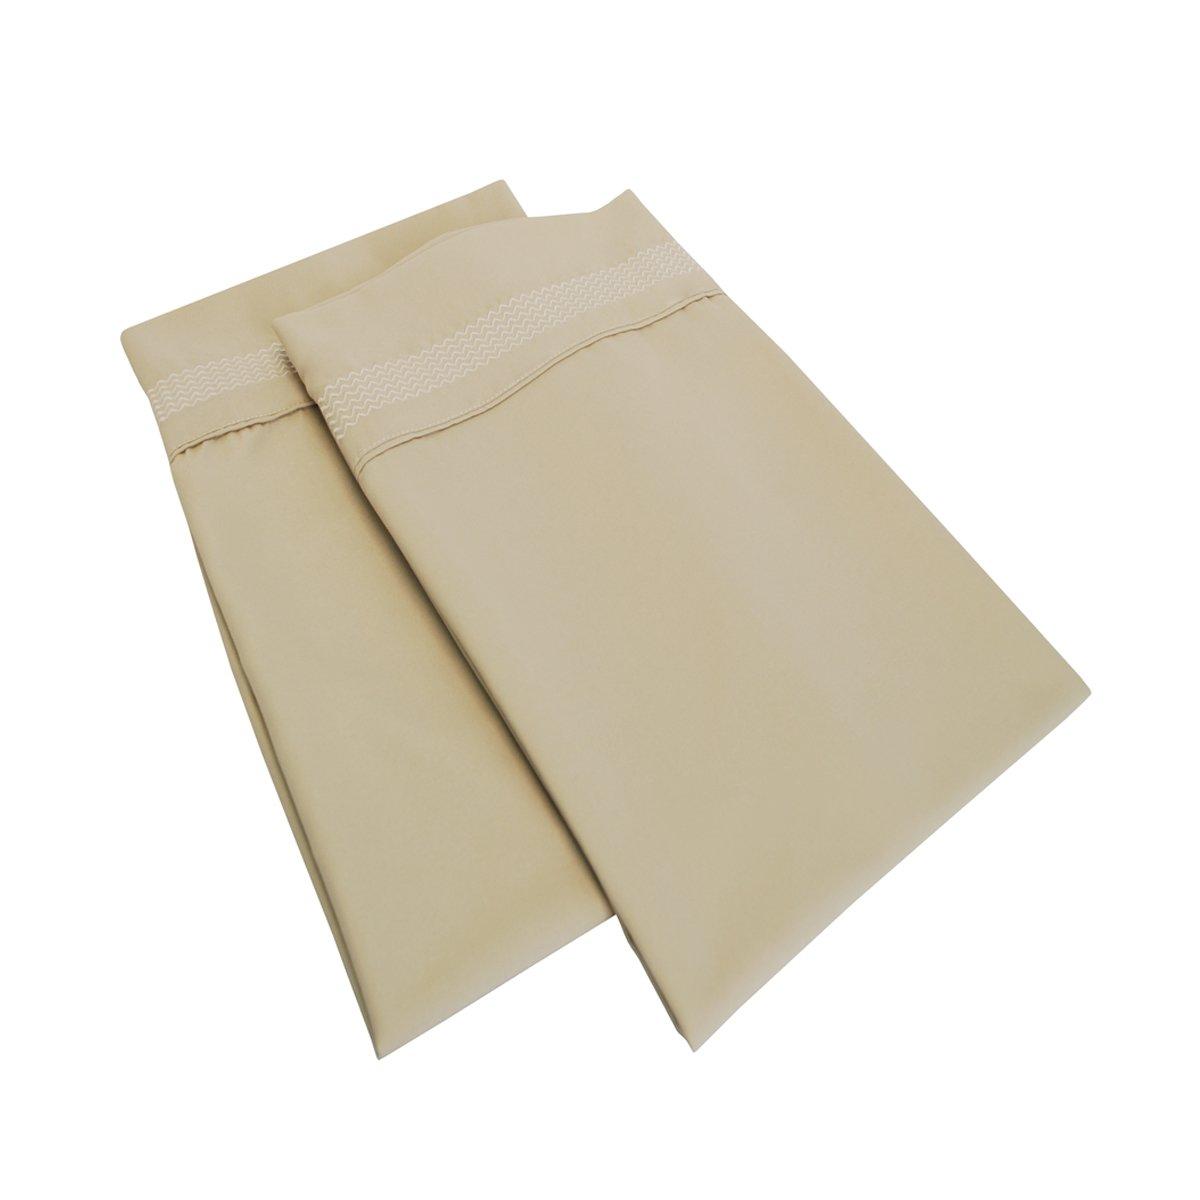 Super Soft Light Weight 100/% Brushed Microfiber Taupe 2-Piece Pillowcase Set with Peaks Hem Detail Superior MF3000KGPC PETPTP Wrinkle Resistant King